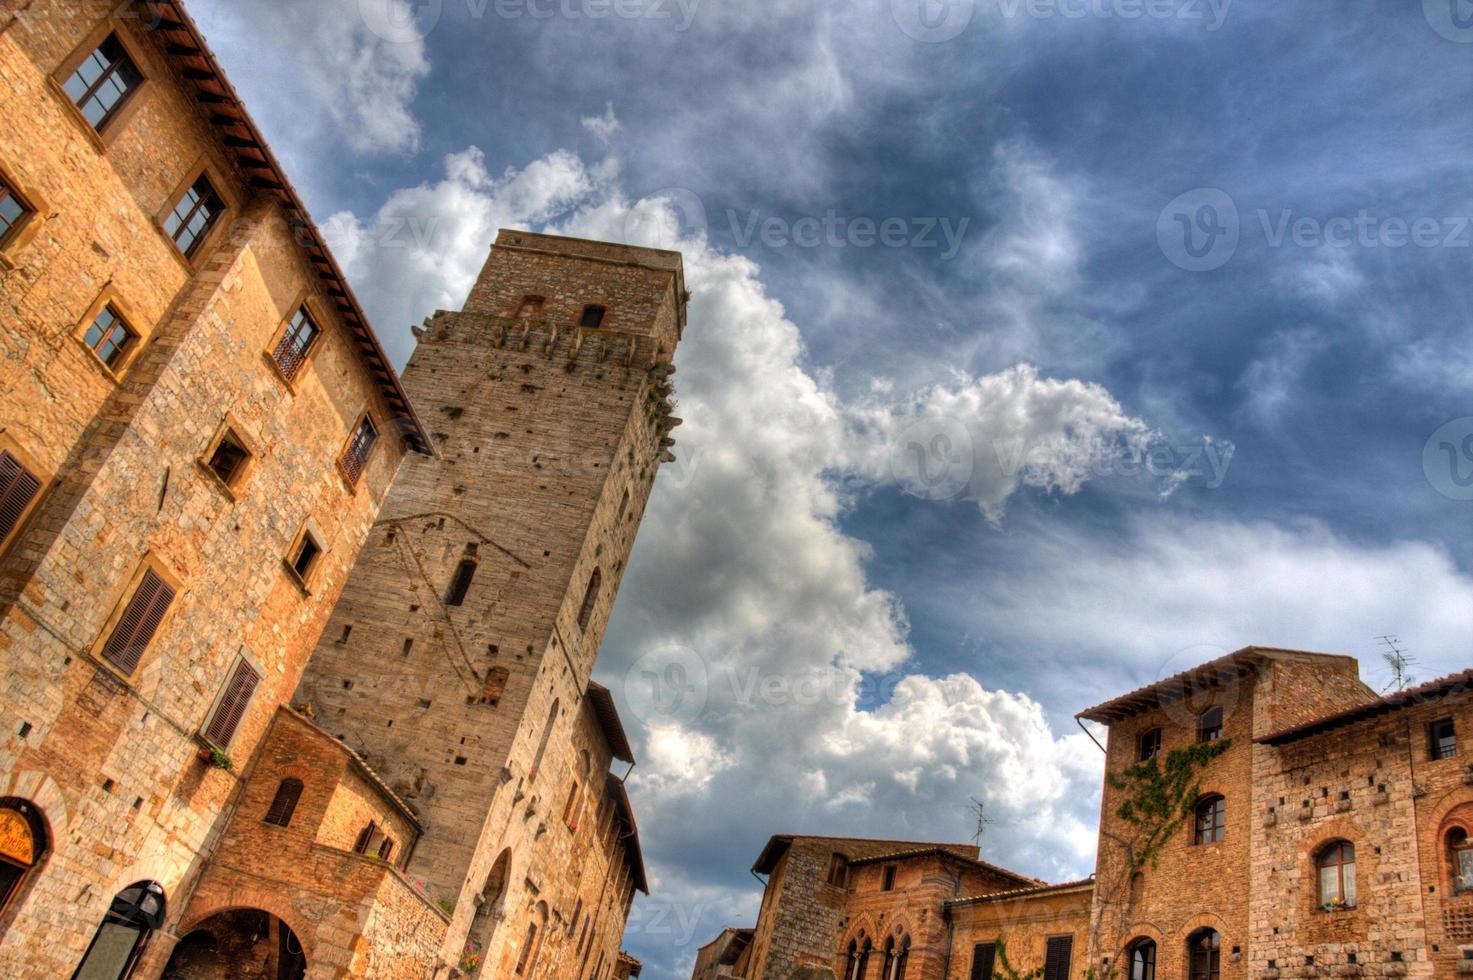 Dramatic San Gimignano photo